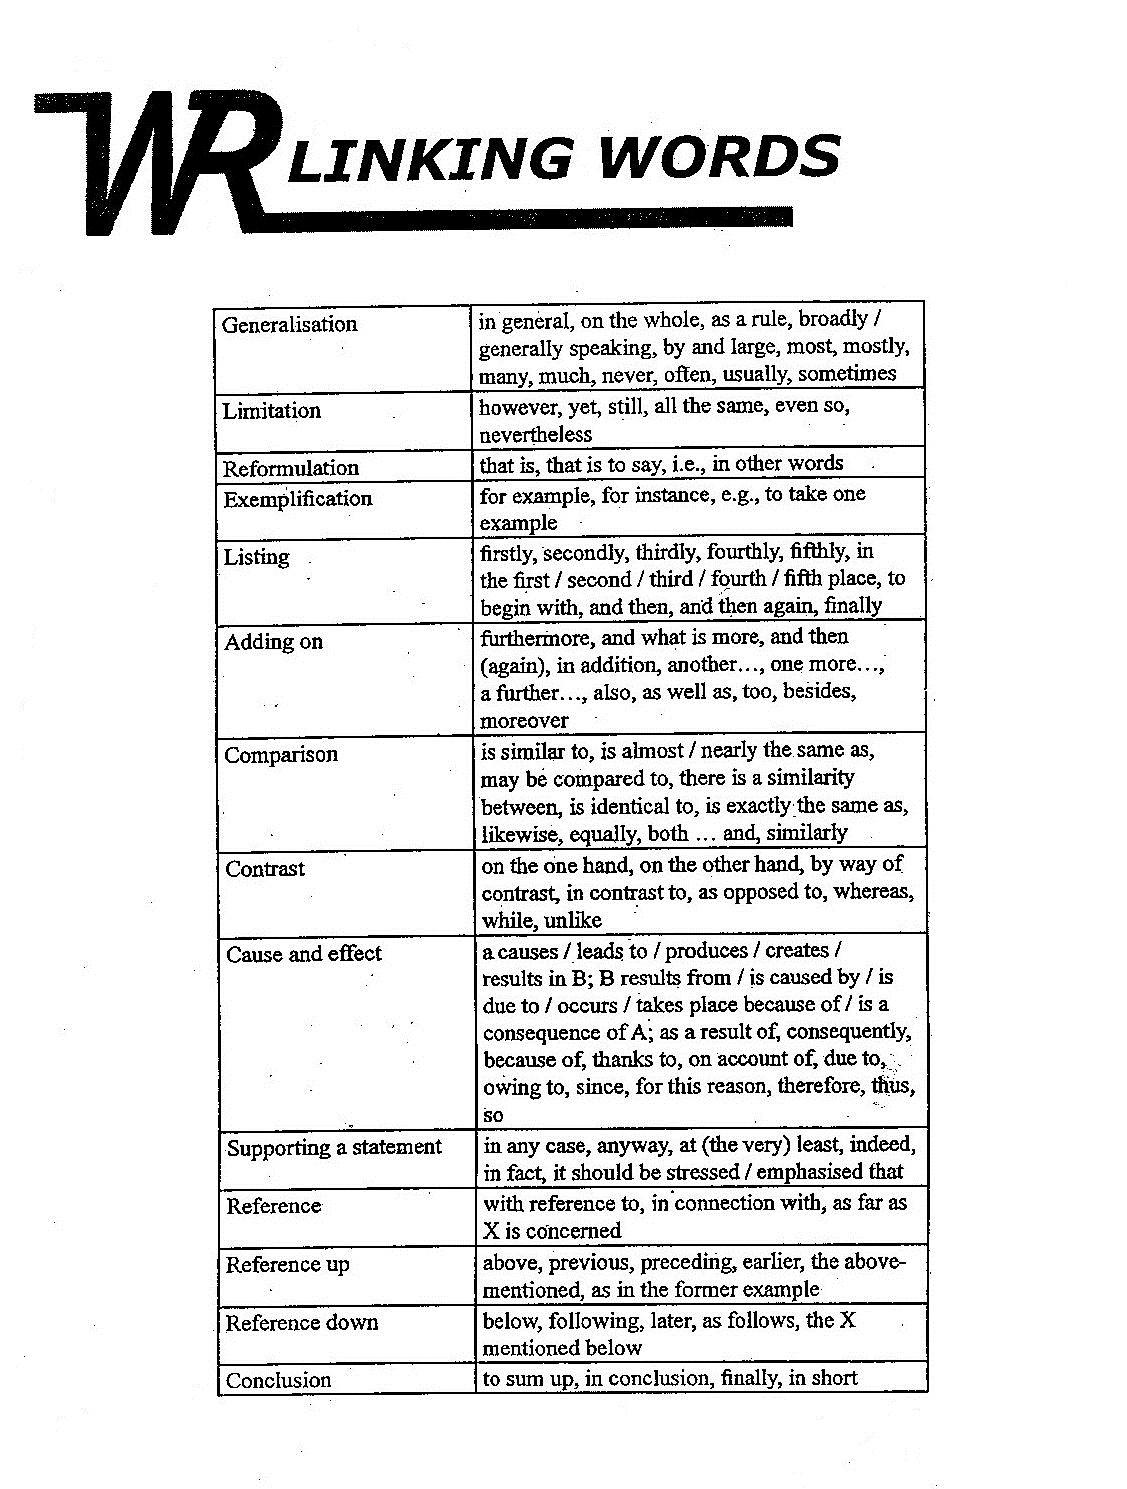 019 Essay Example Argumentative Topics Beautiful 2017 The Most Popular Of List Cxc Full